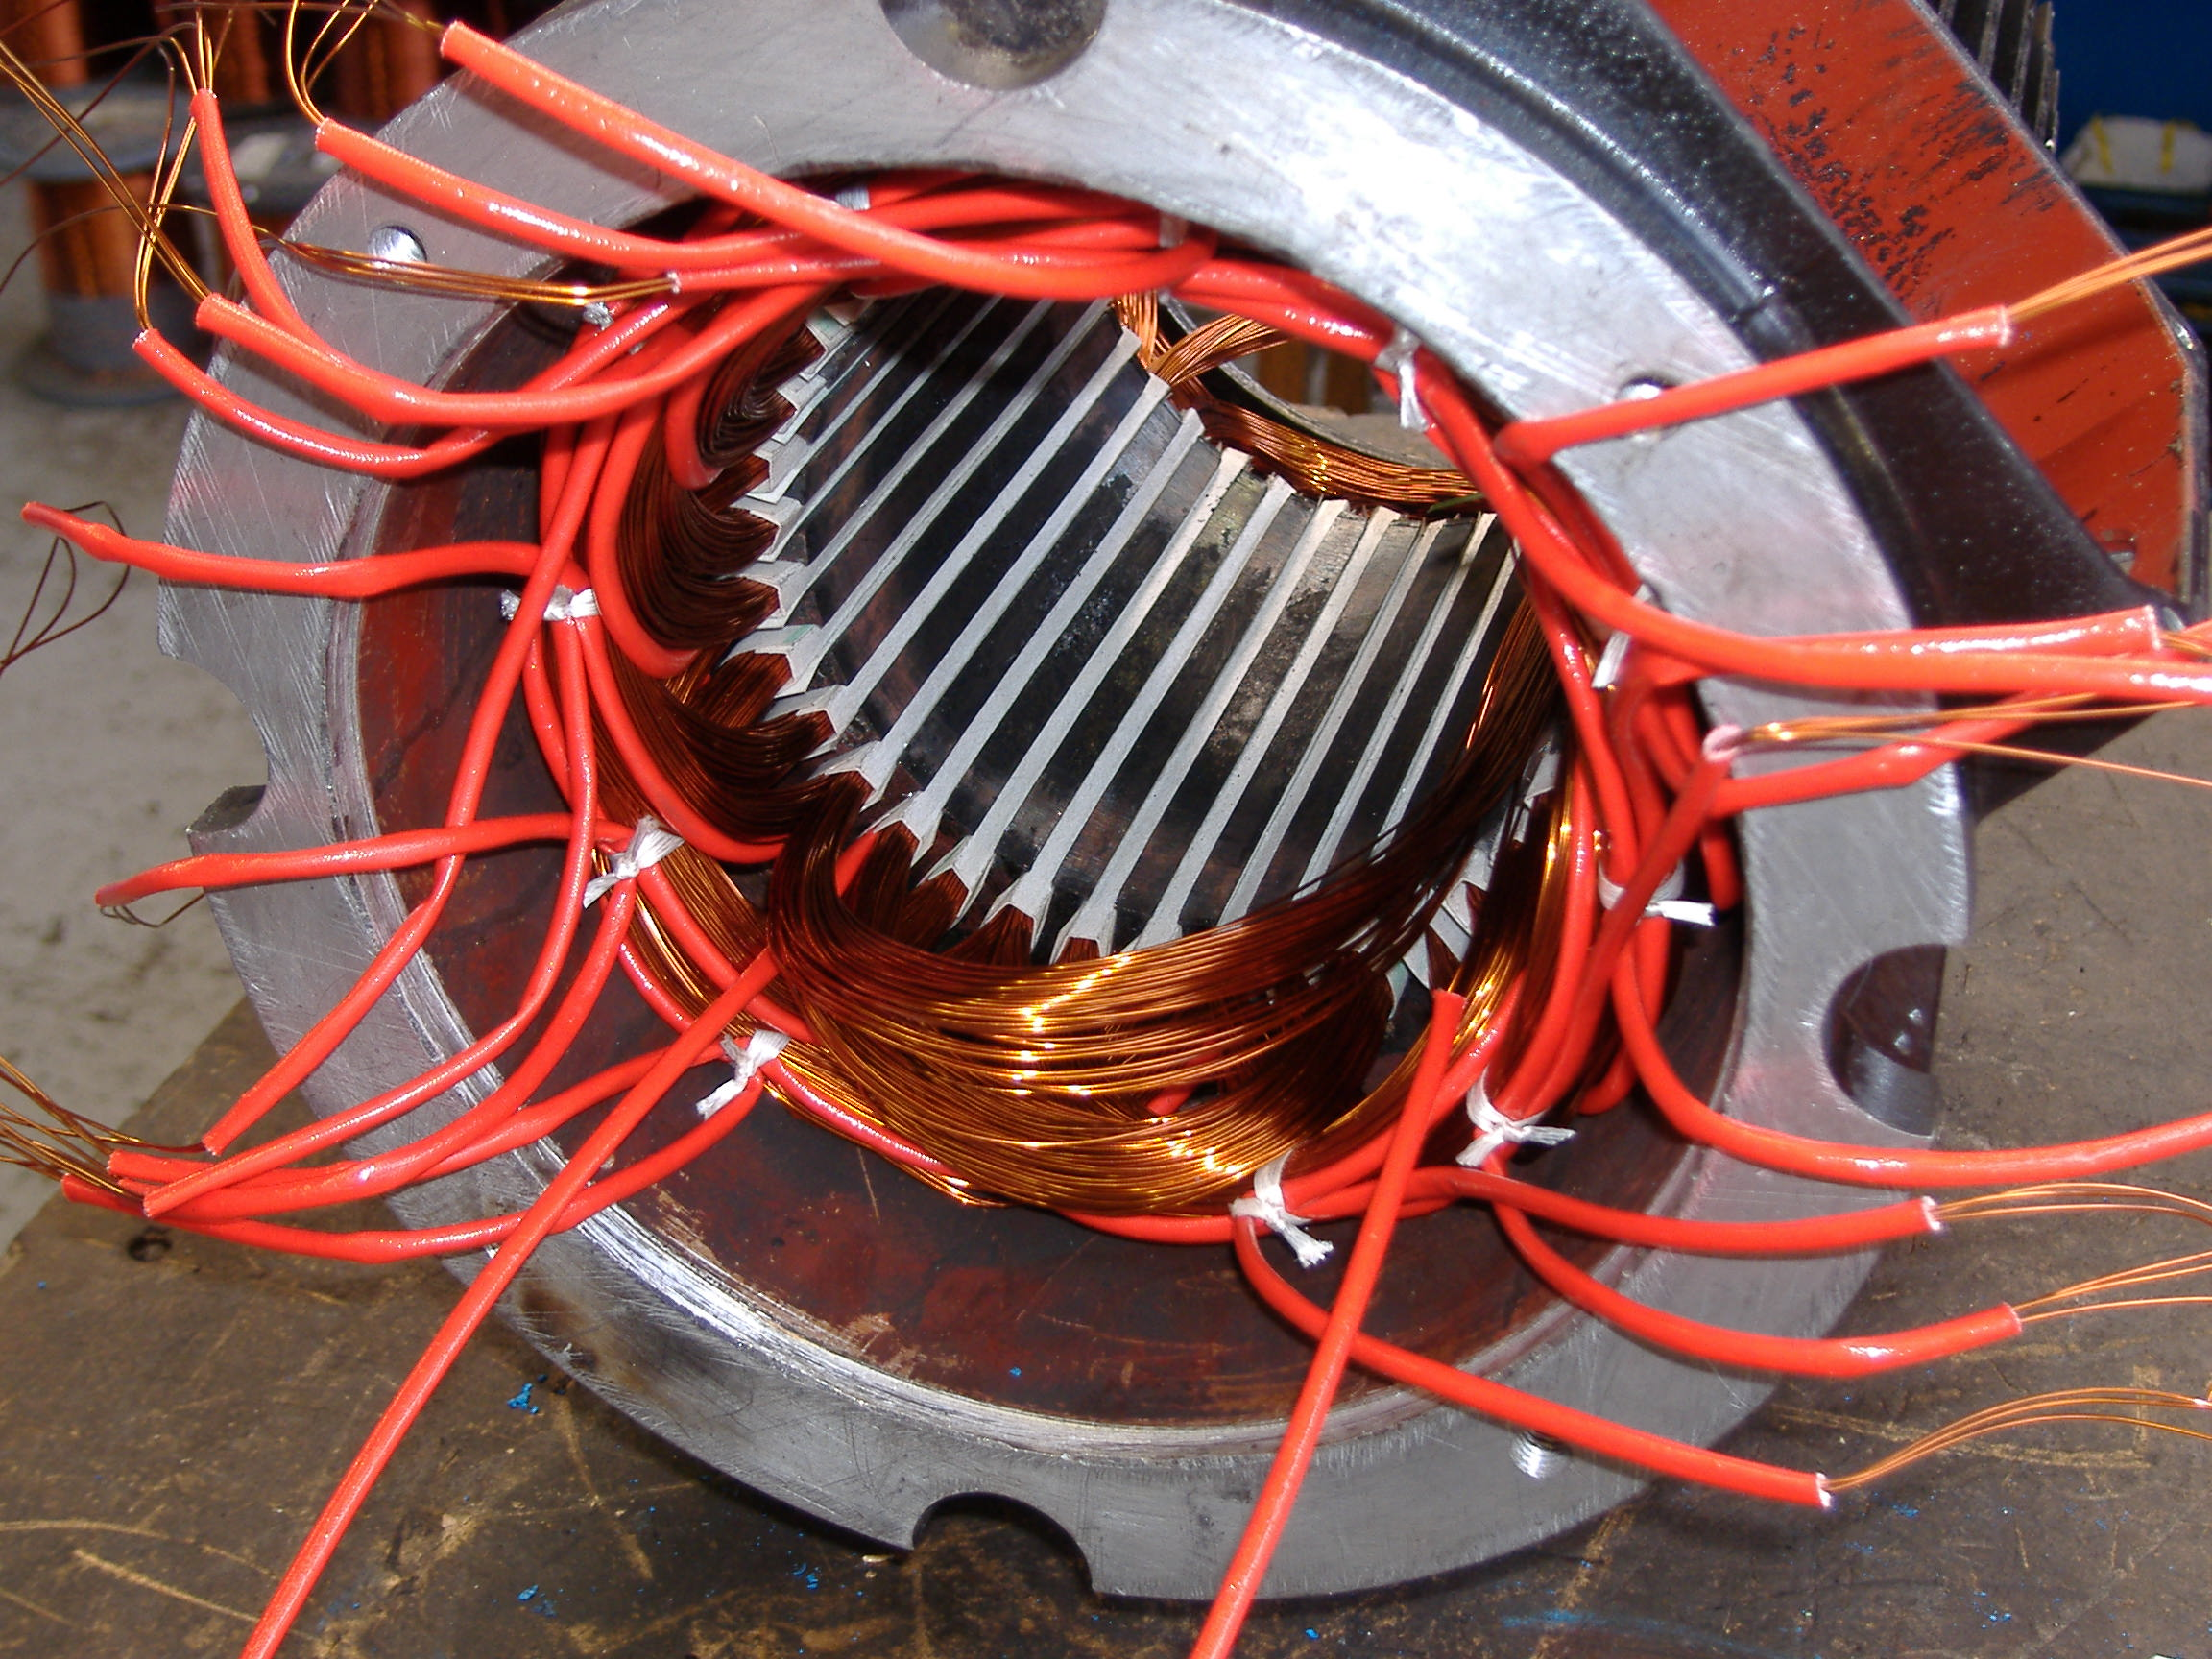 Ol gustavo armature winders for Electric motor repair company